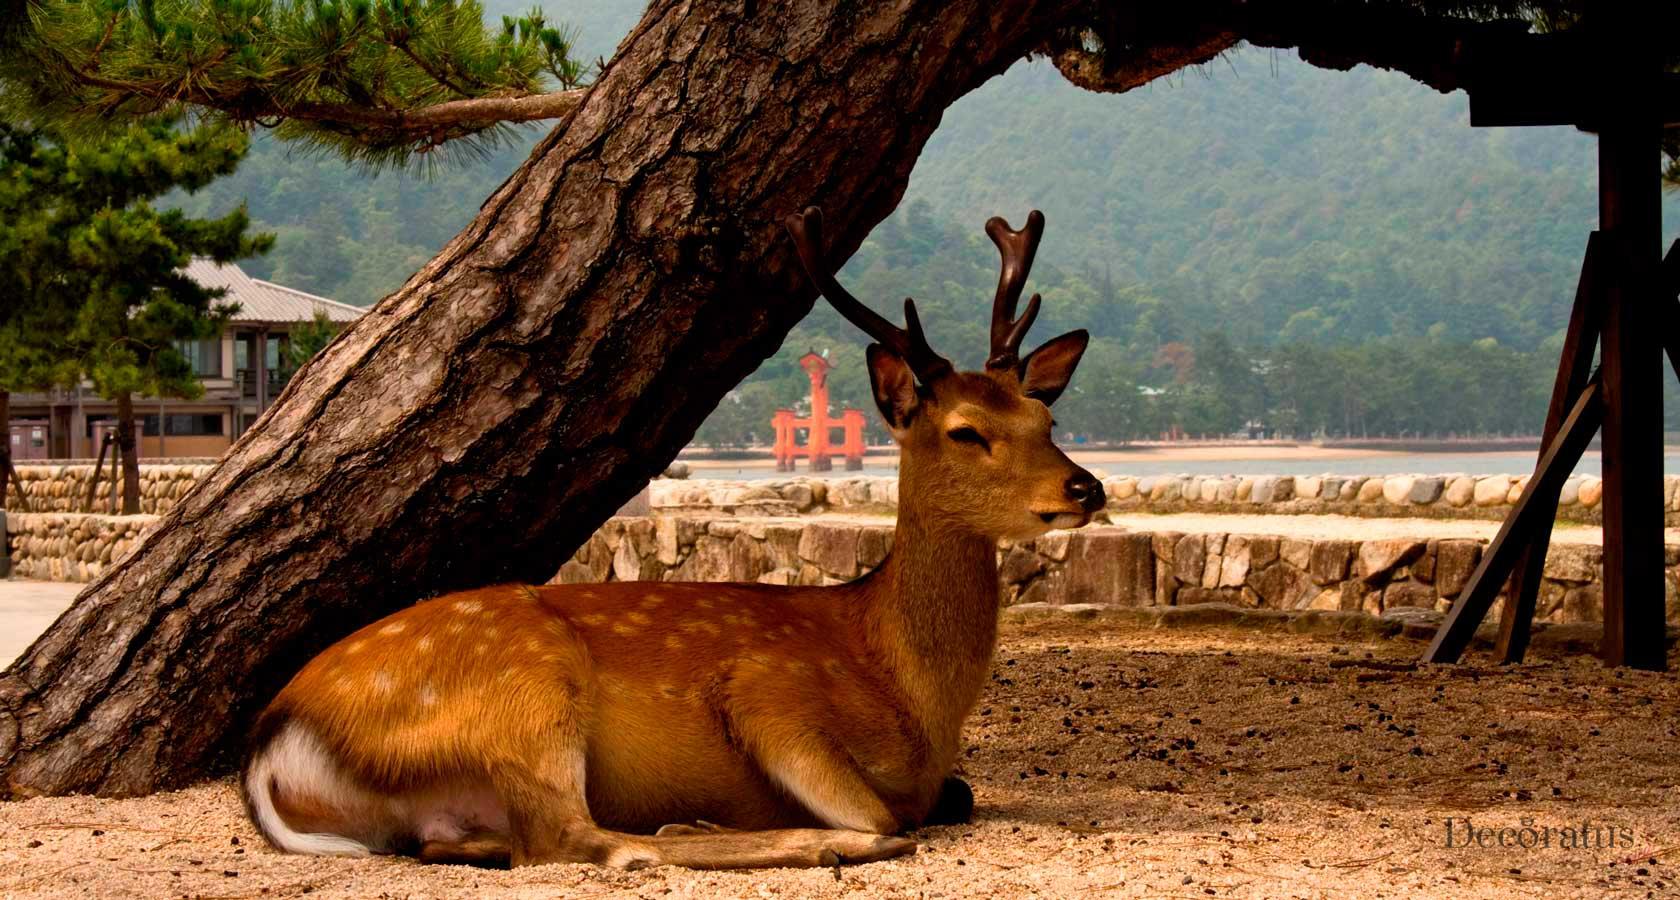 олени в святилище миядзима ицукусима в японии